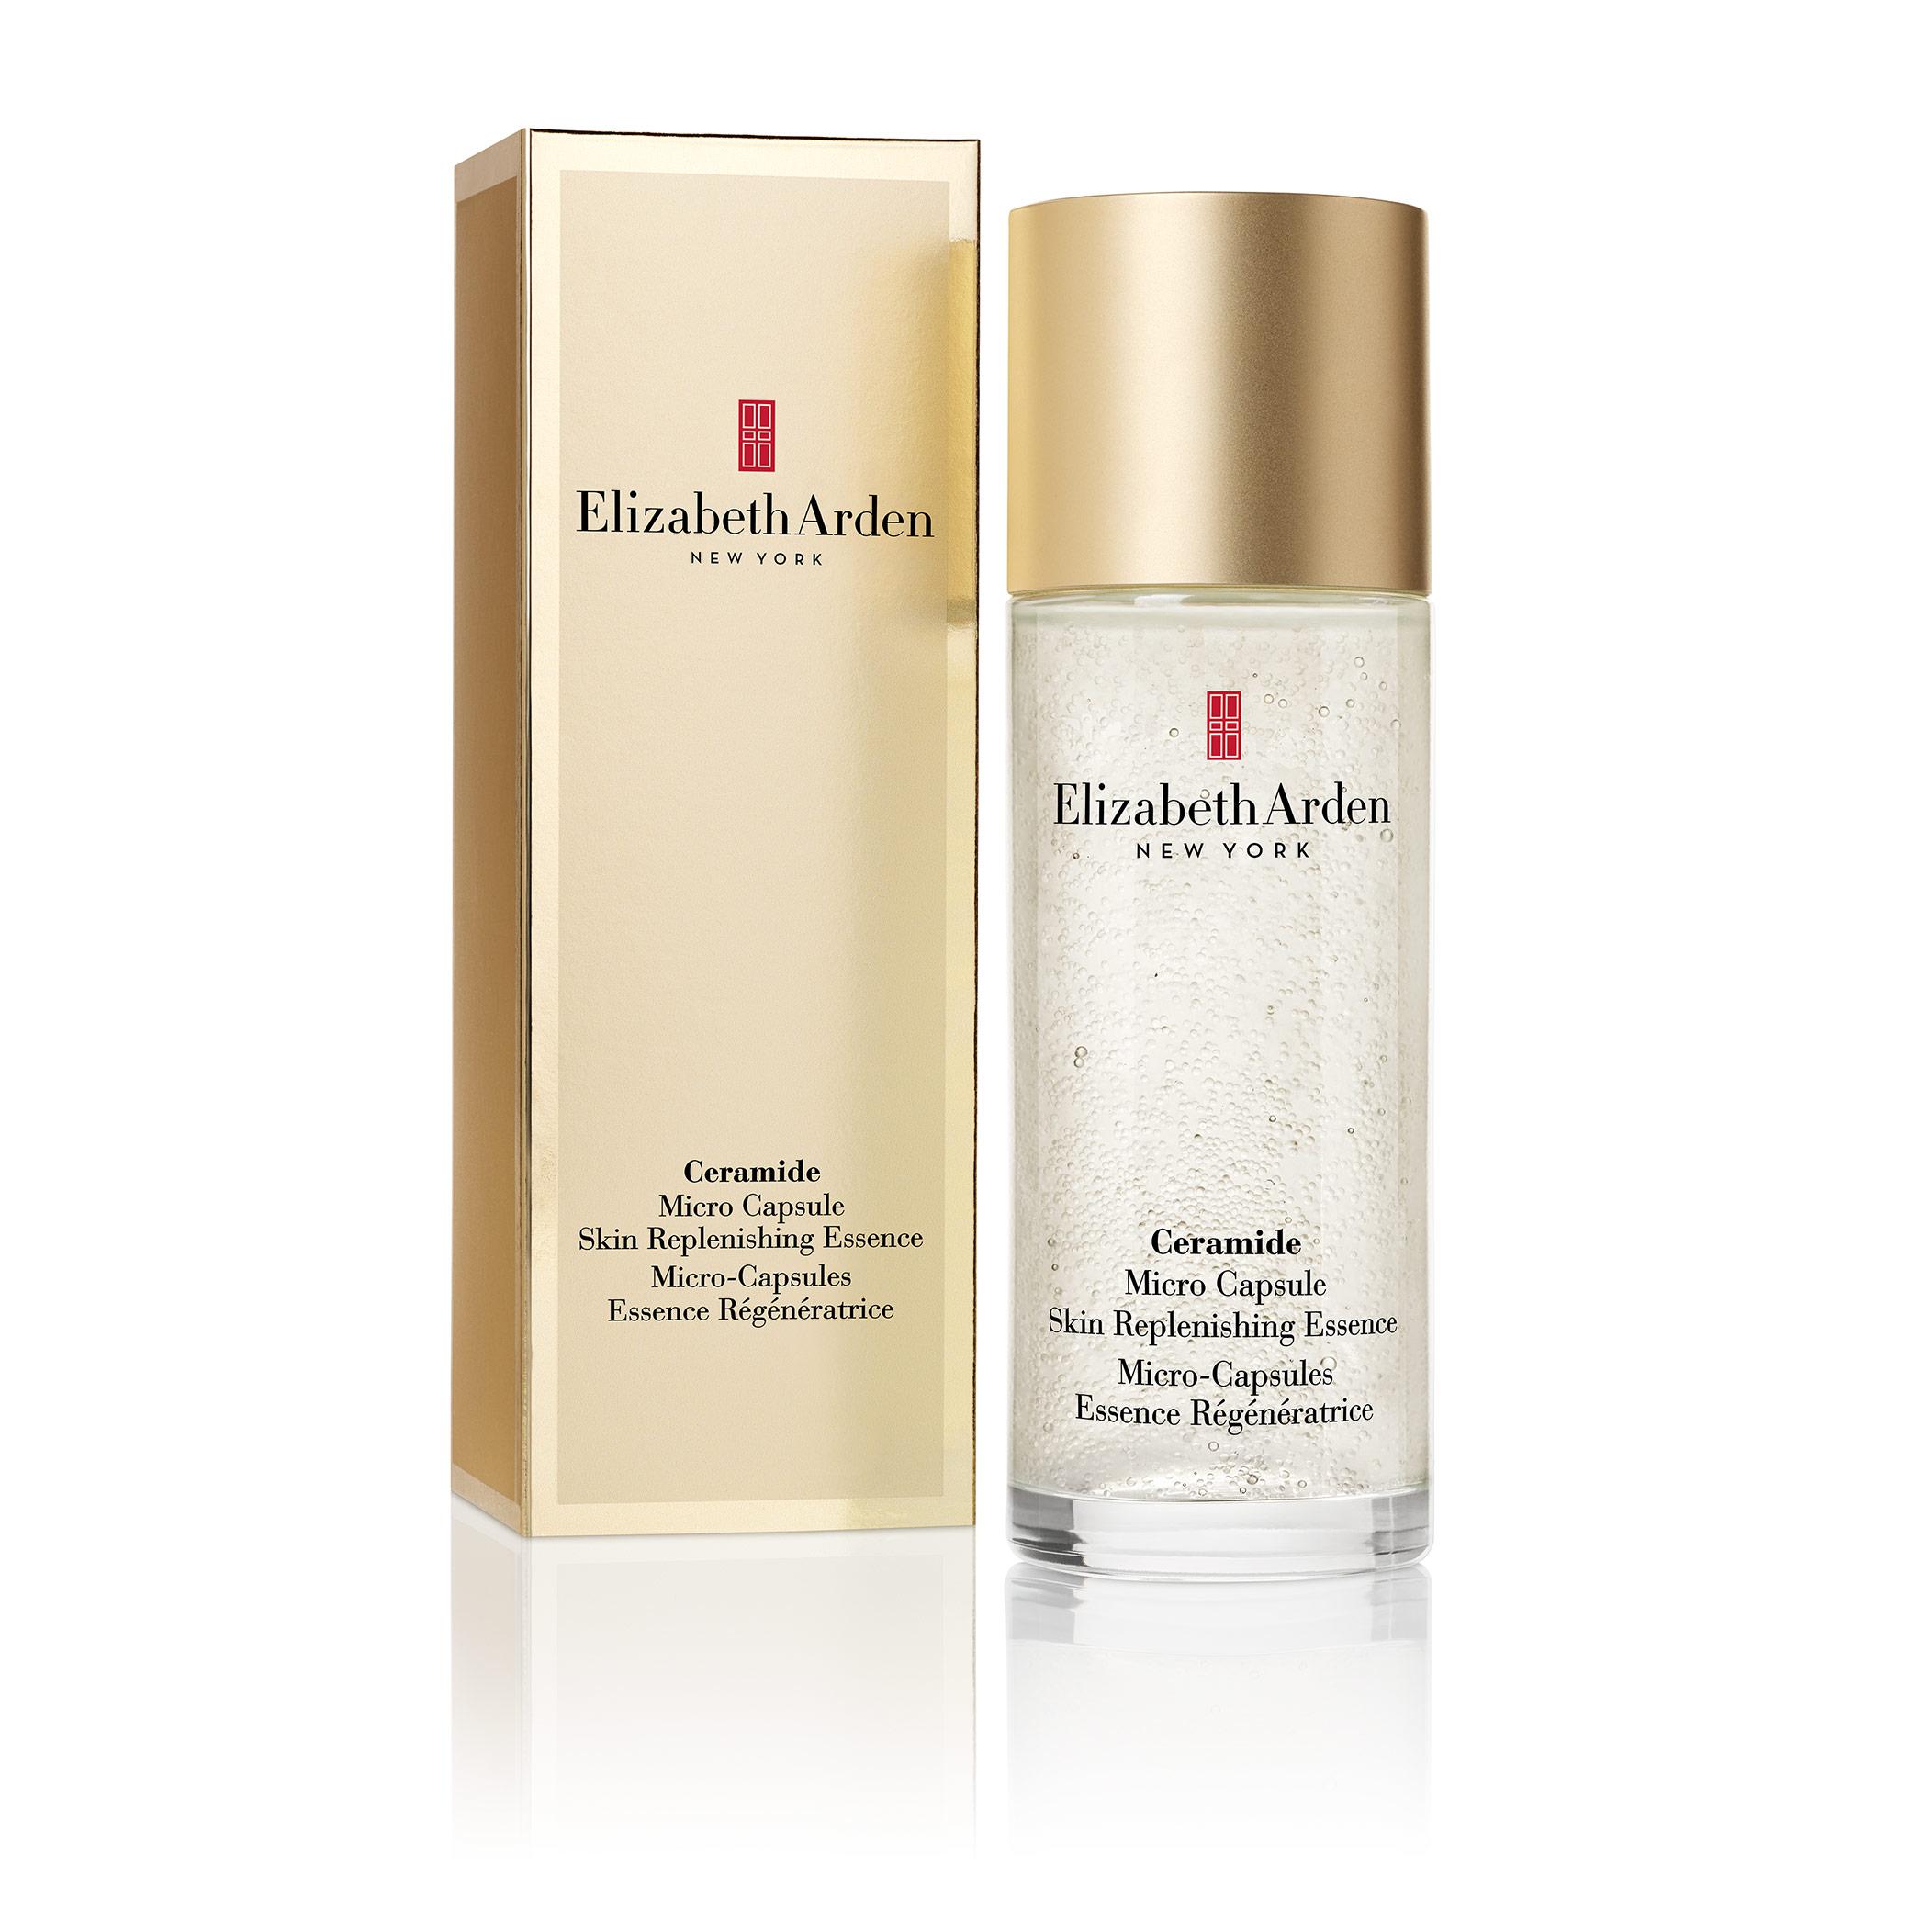 Ceramide Micro Capsule Skin Replenishing Essence - 90ml, , large